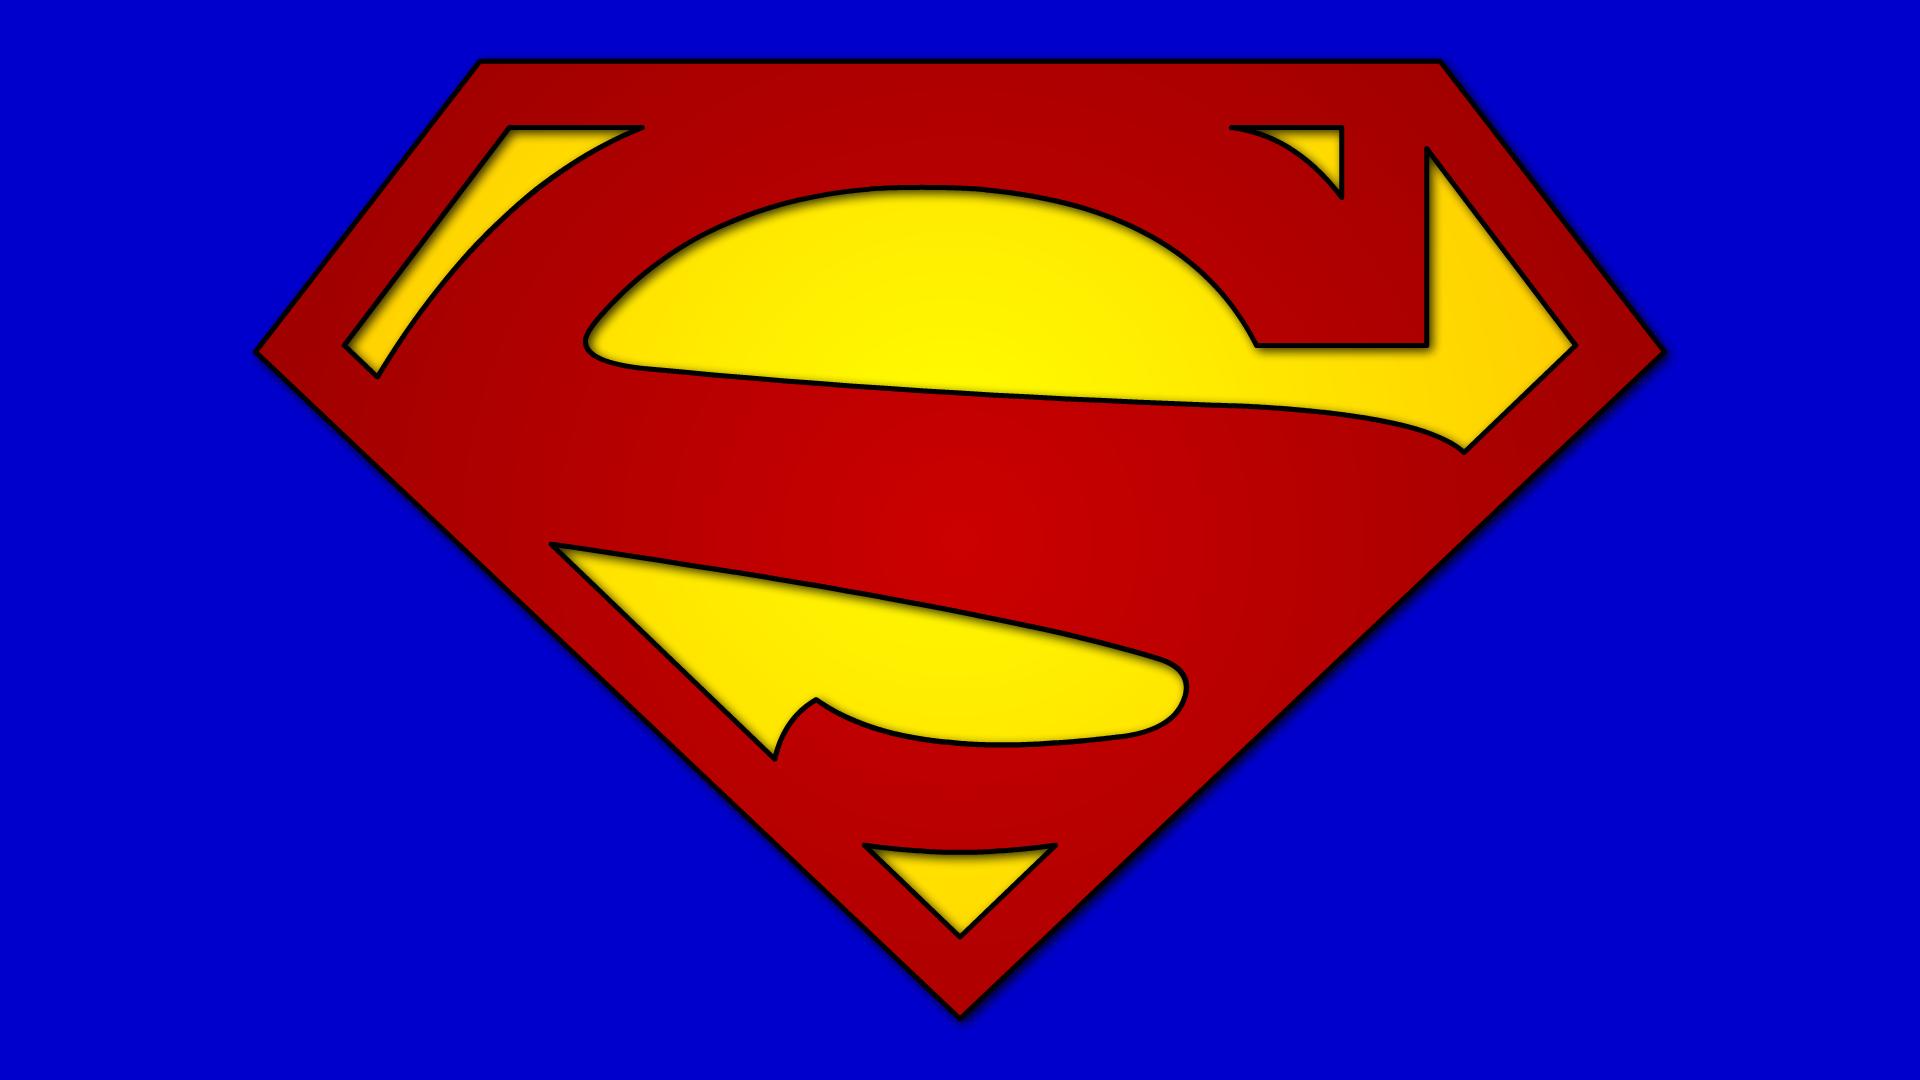 Superman symbol image free download best superman symbol image on 1920x1080 superman new 52 symbol by yurtigo on deviantart voltagebd Gallery